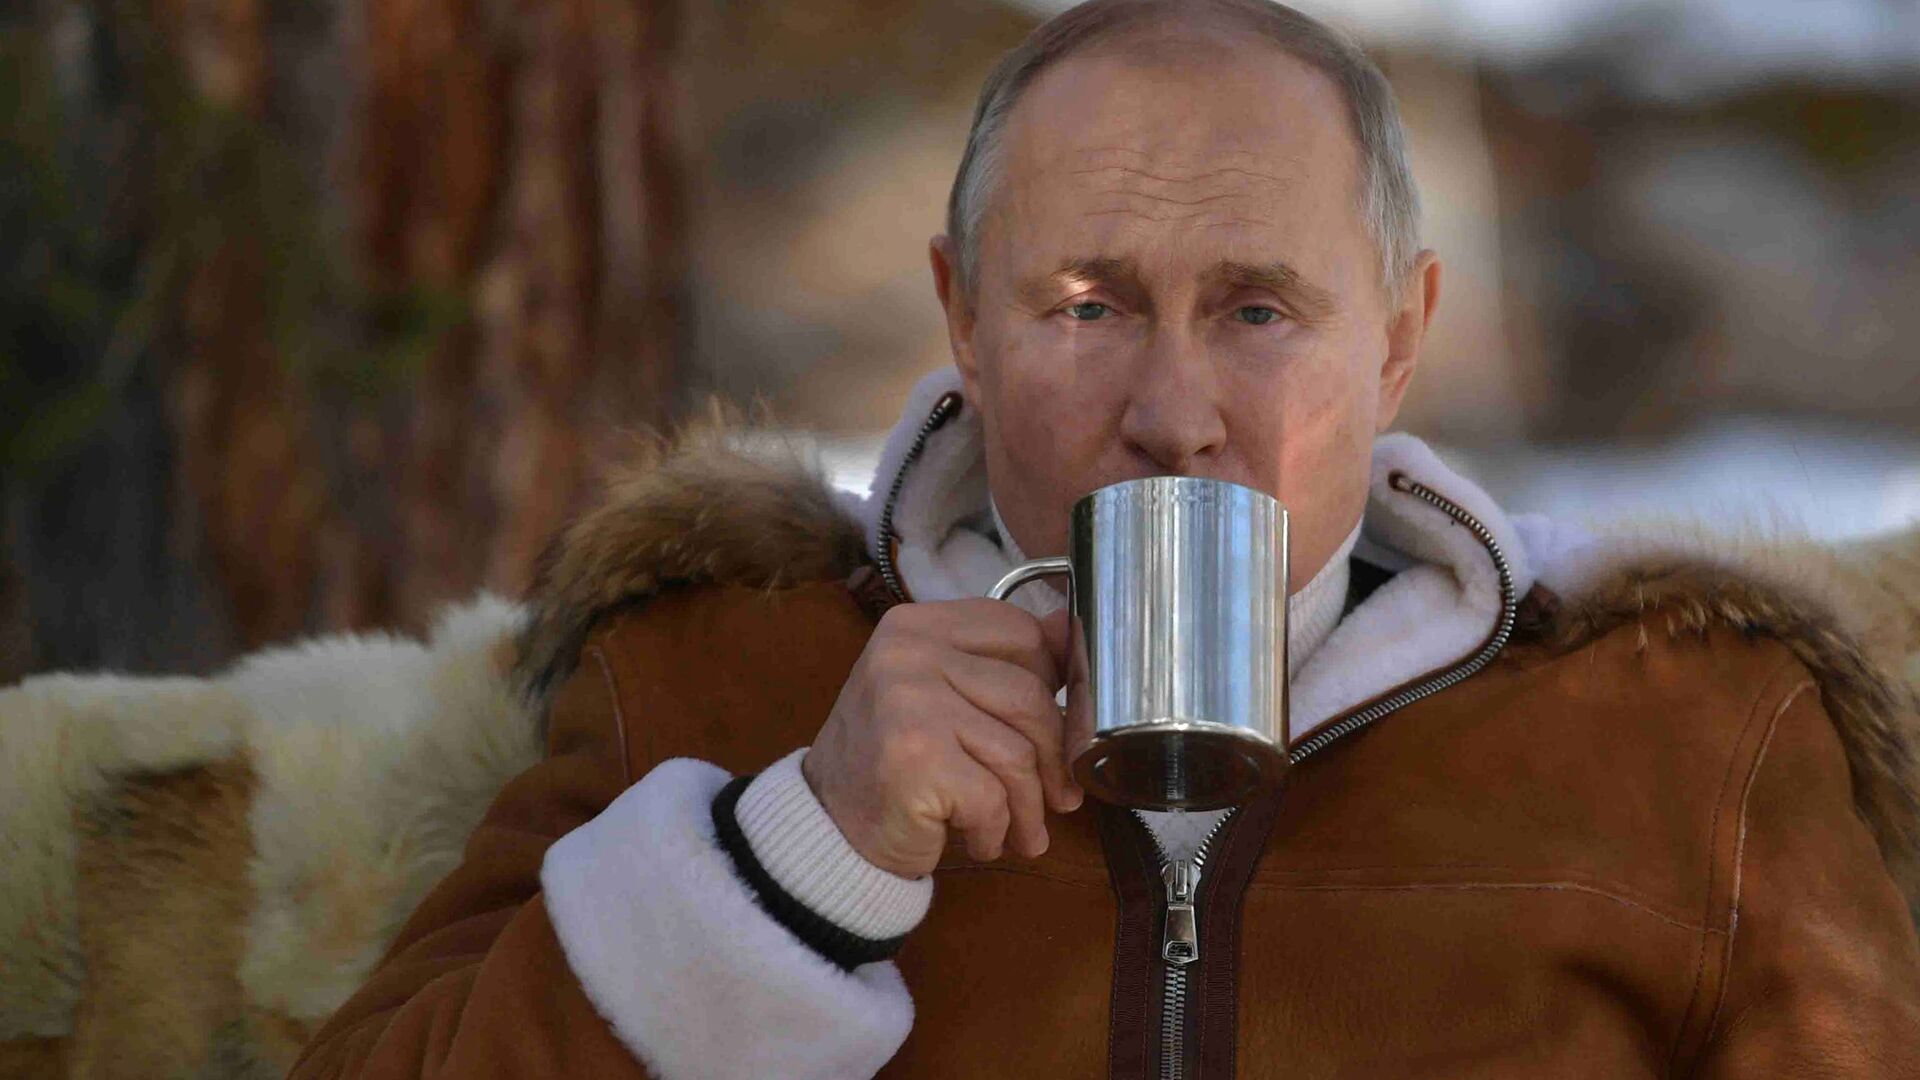 Riposo di Putin e ministro Difesa Shoigu in Siberia - Sputnik Italia, 1920, 16.07.2021